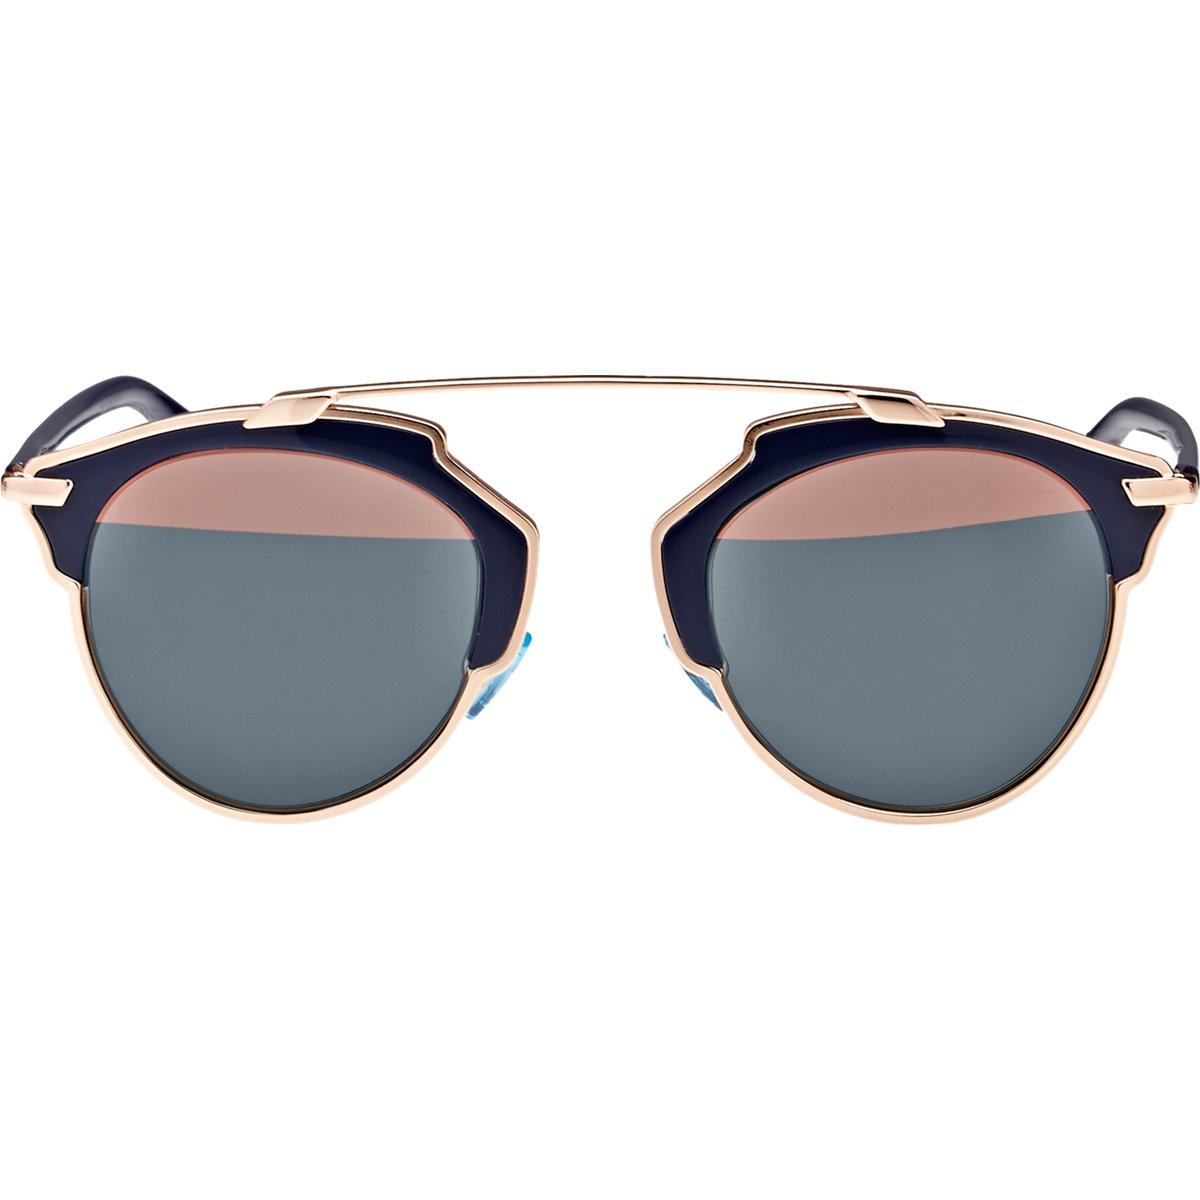 7223f752f7ec Lyst - Dior So Real Sunglasses in Metallic